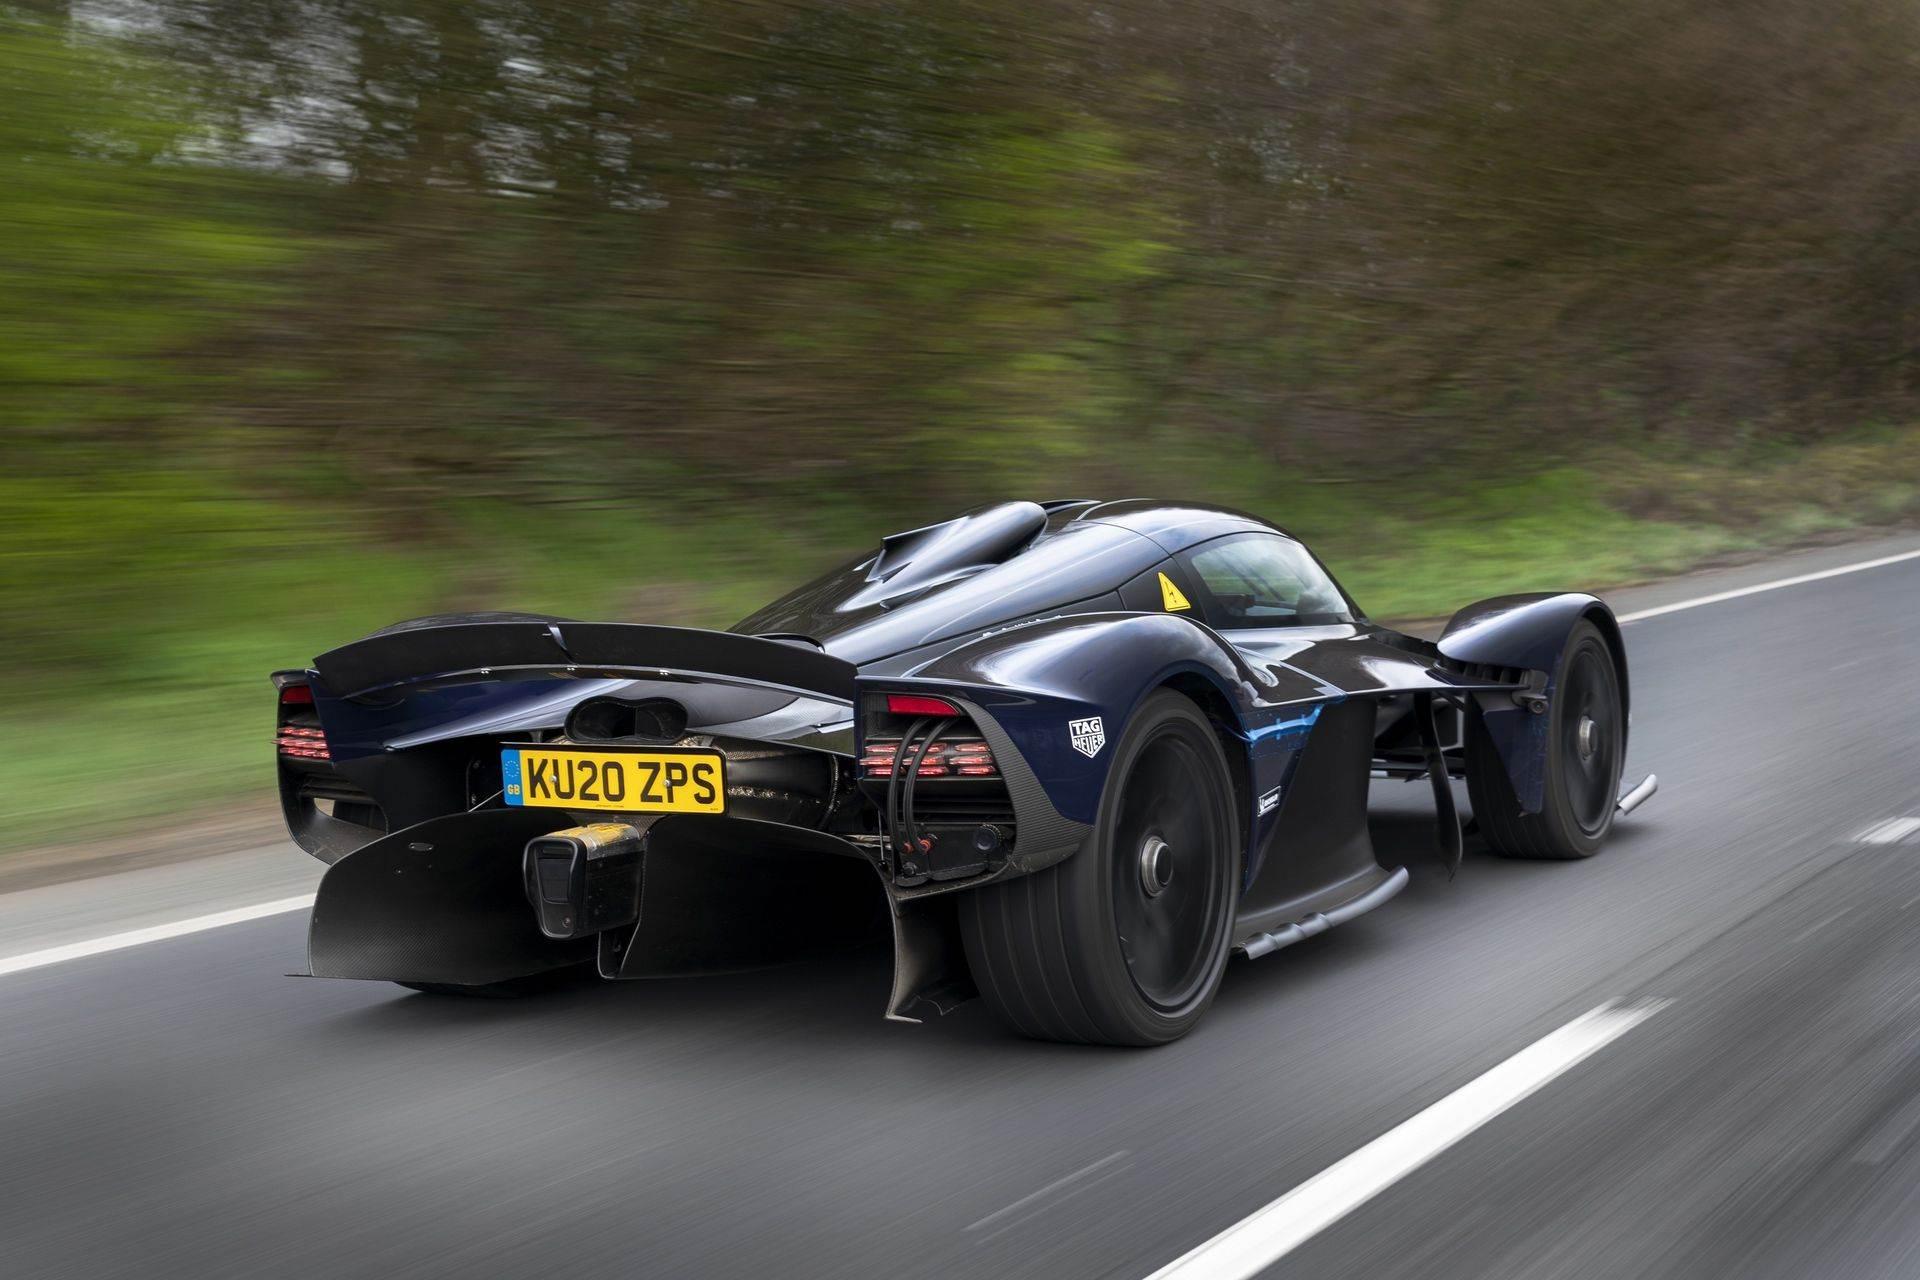 Aston_Martin_Valkyrie_public_roads_0002